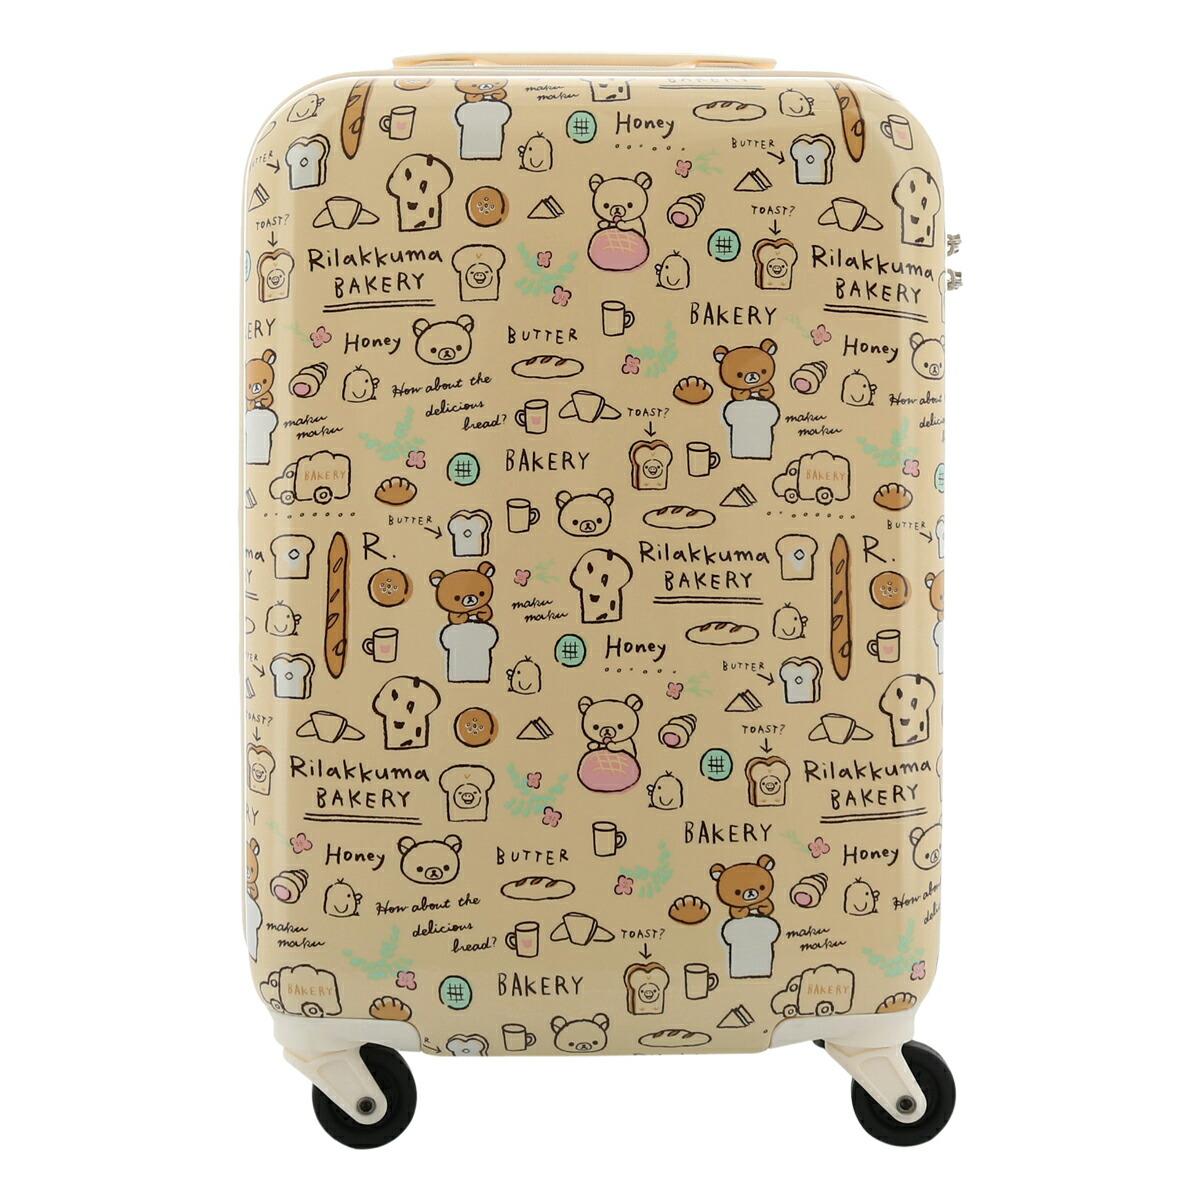 17bf6d29c8 リラックマ スーツケース 31L 47cm 2RK0-47H Rilakkuma | キャリーケース ...